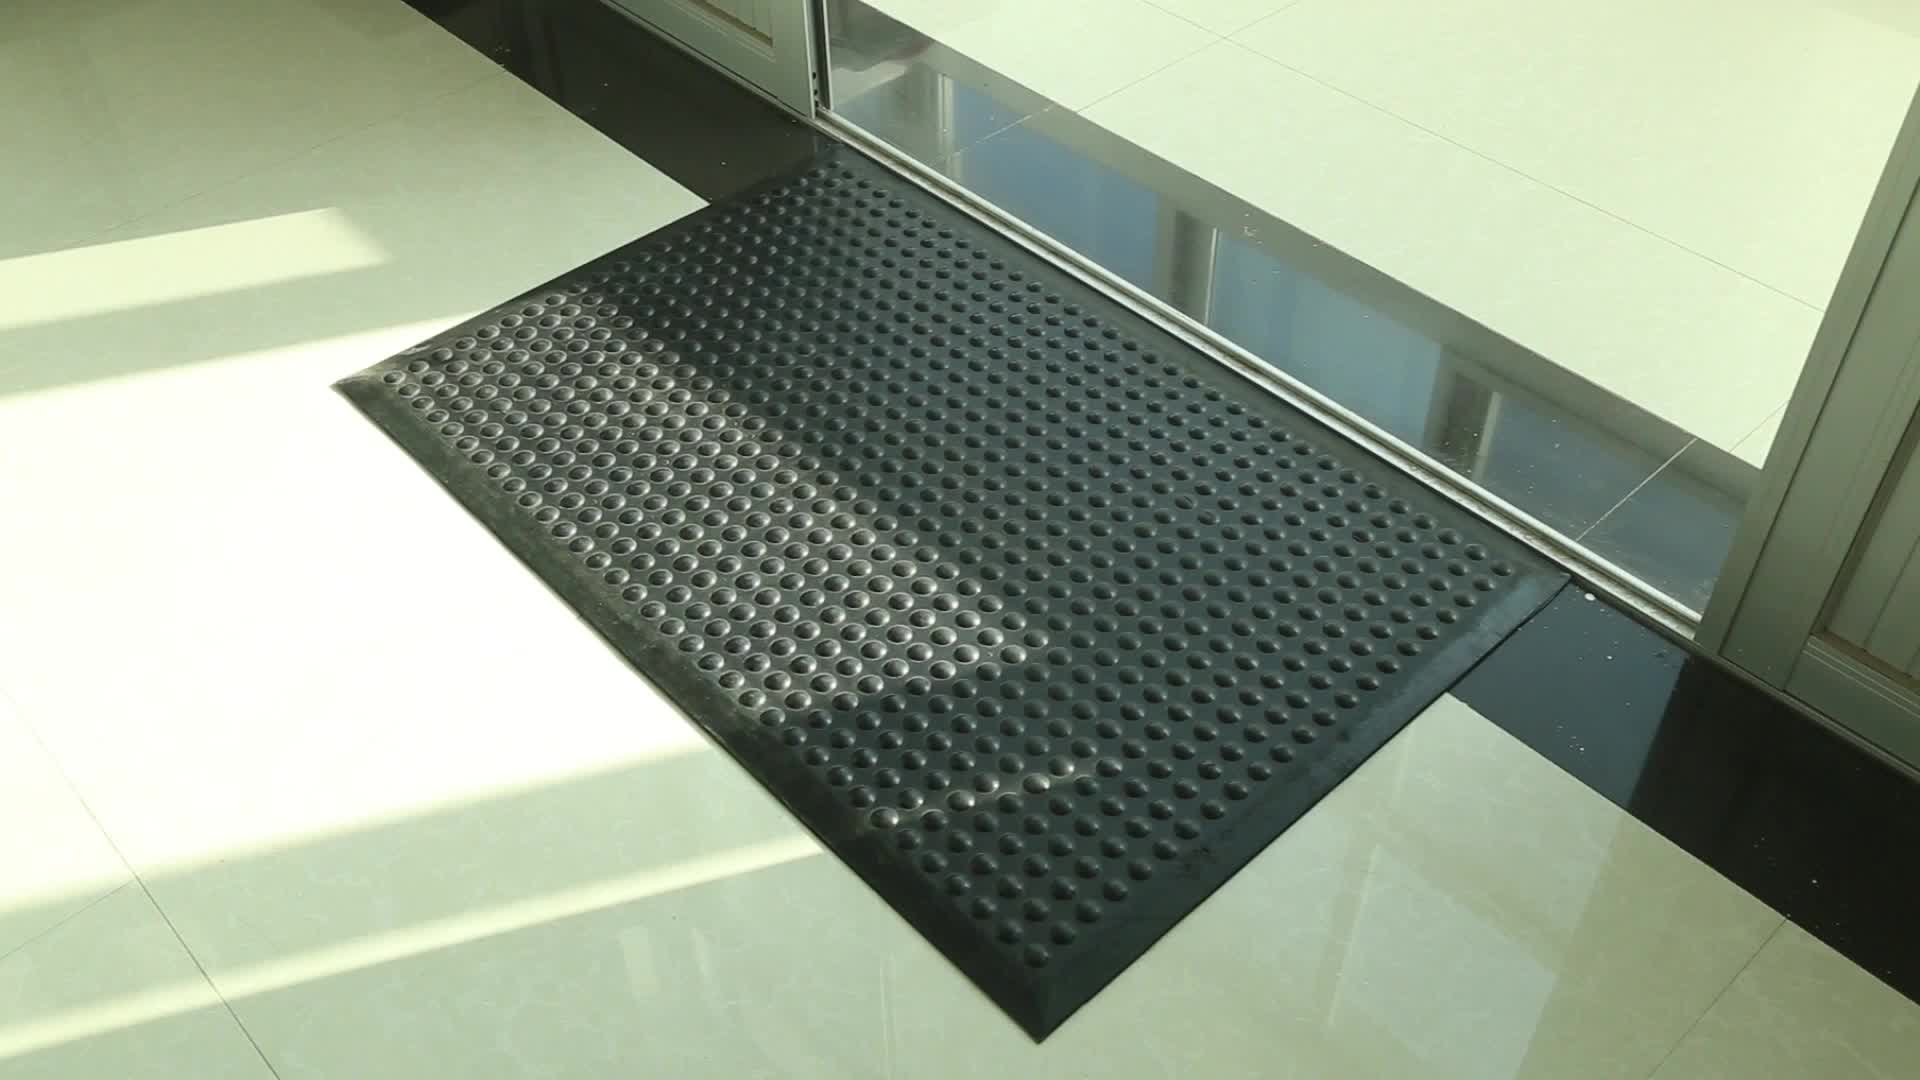 Rubber Anti Fatigue Floor Mat Rubber Mat With Beveled